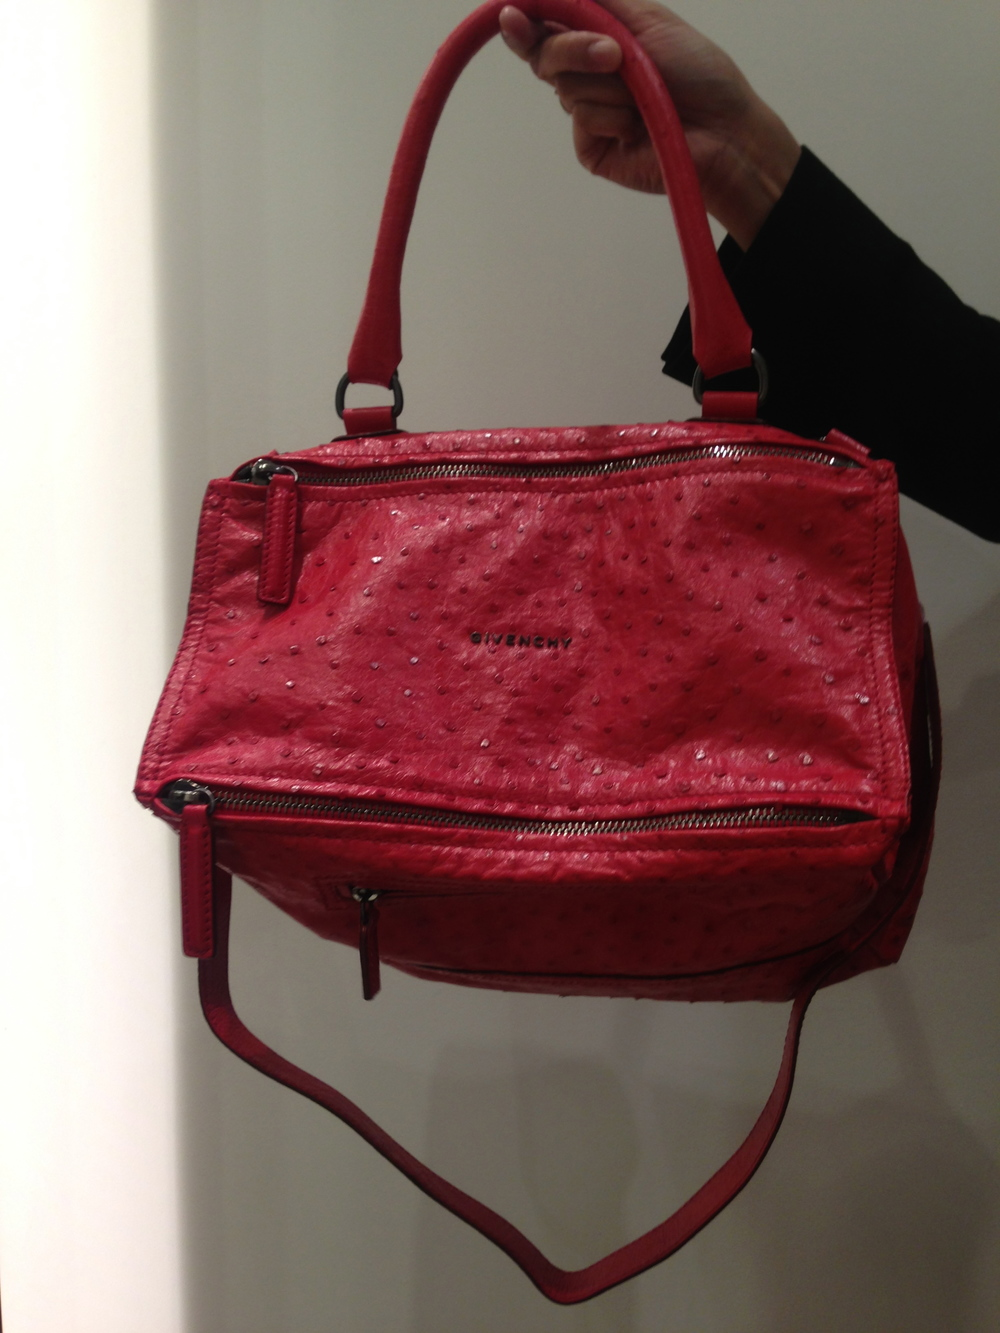 Givenchy Ostrich Skin Pandora Bag